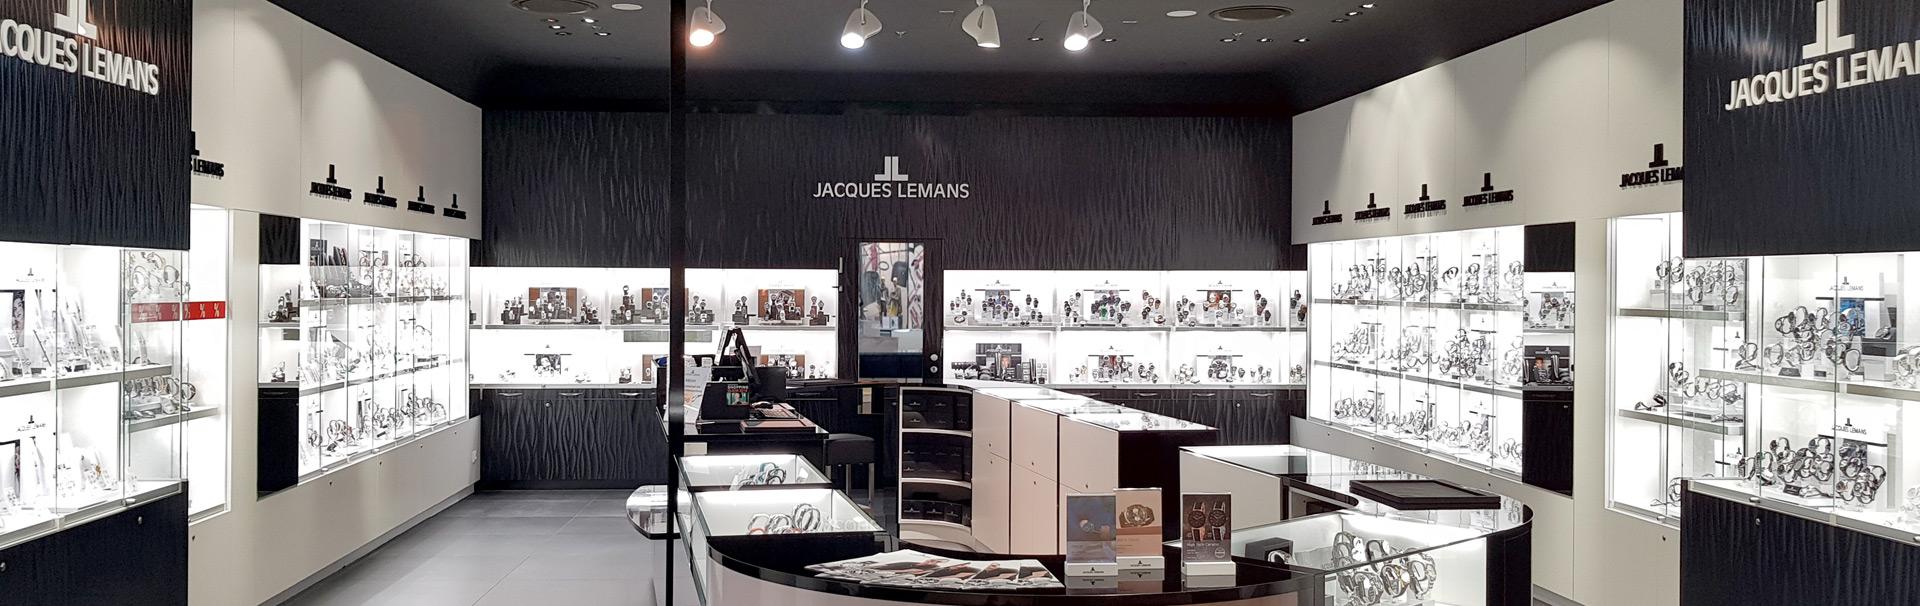 Flagship Store Atrio Innenansicht | Jacques Lemans®